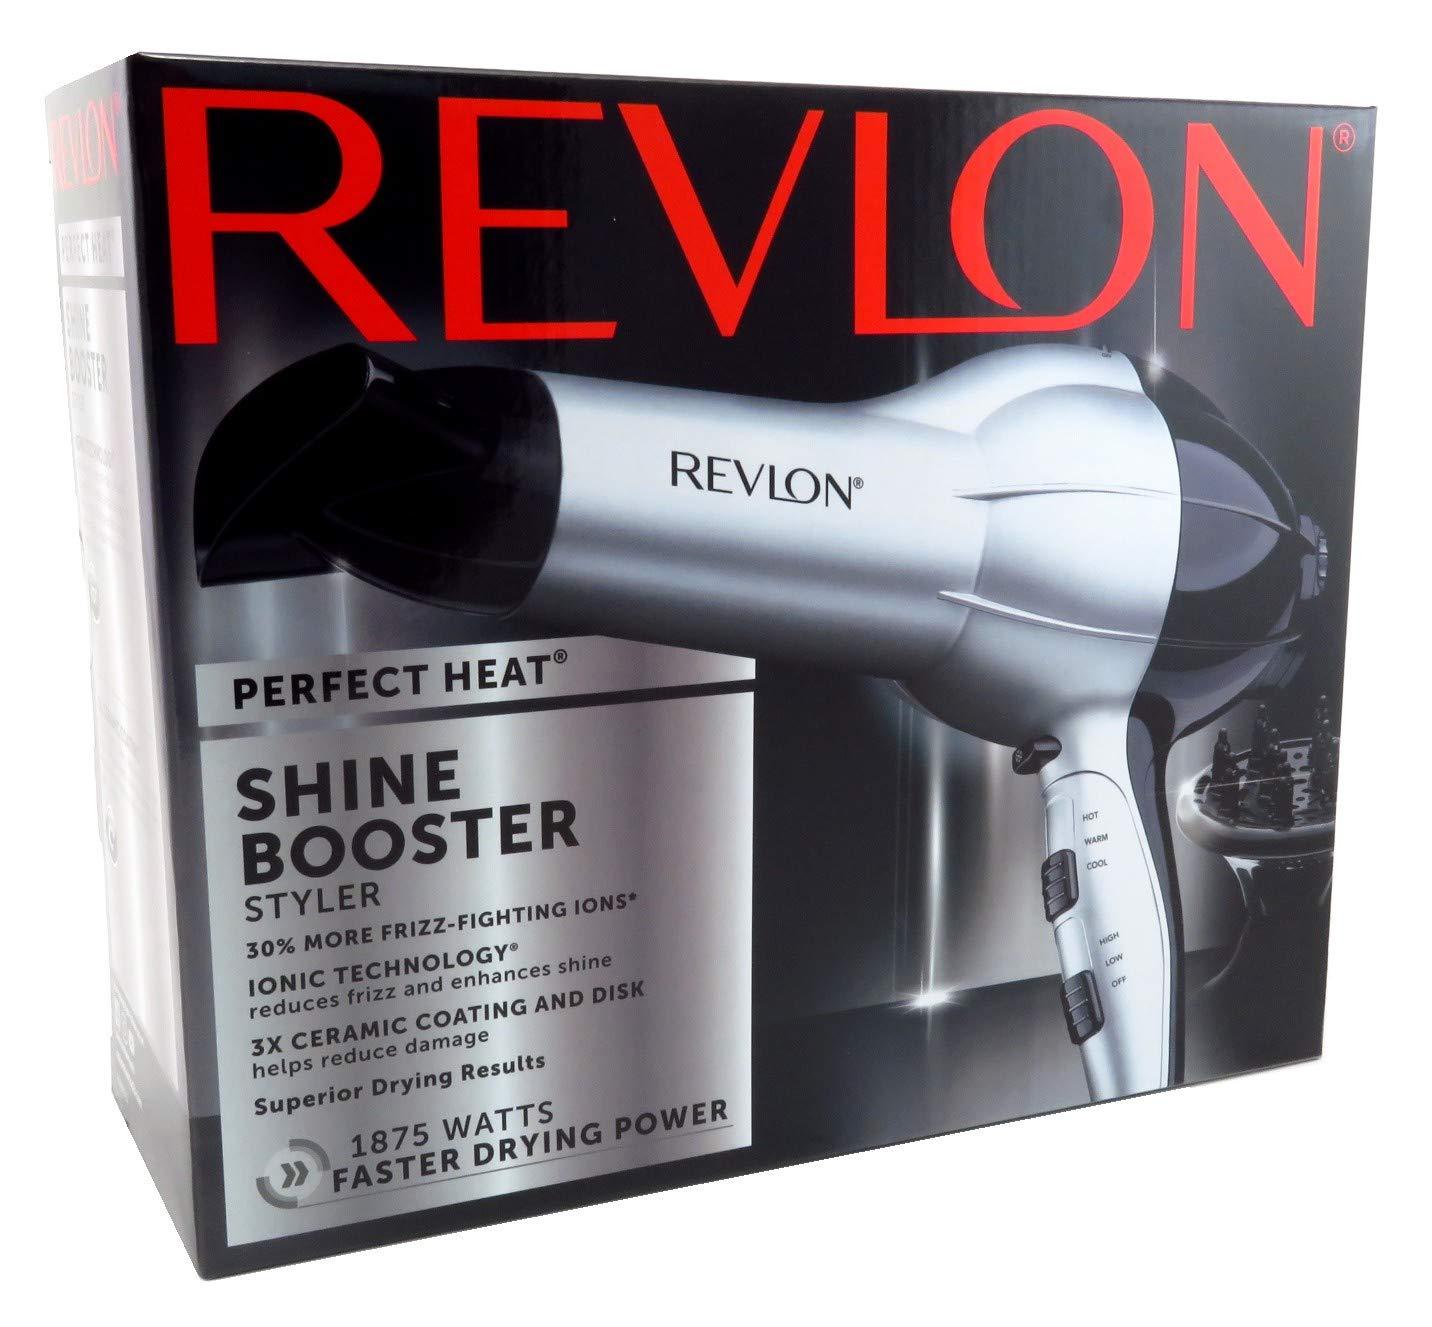 Revlon Dryer Shine Booster 1875 Watt Tourmaline With Diffusr